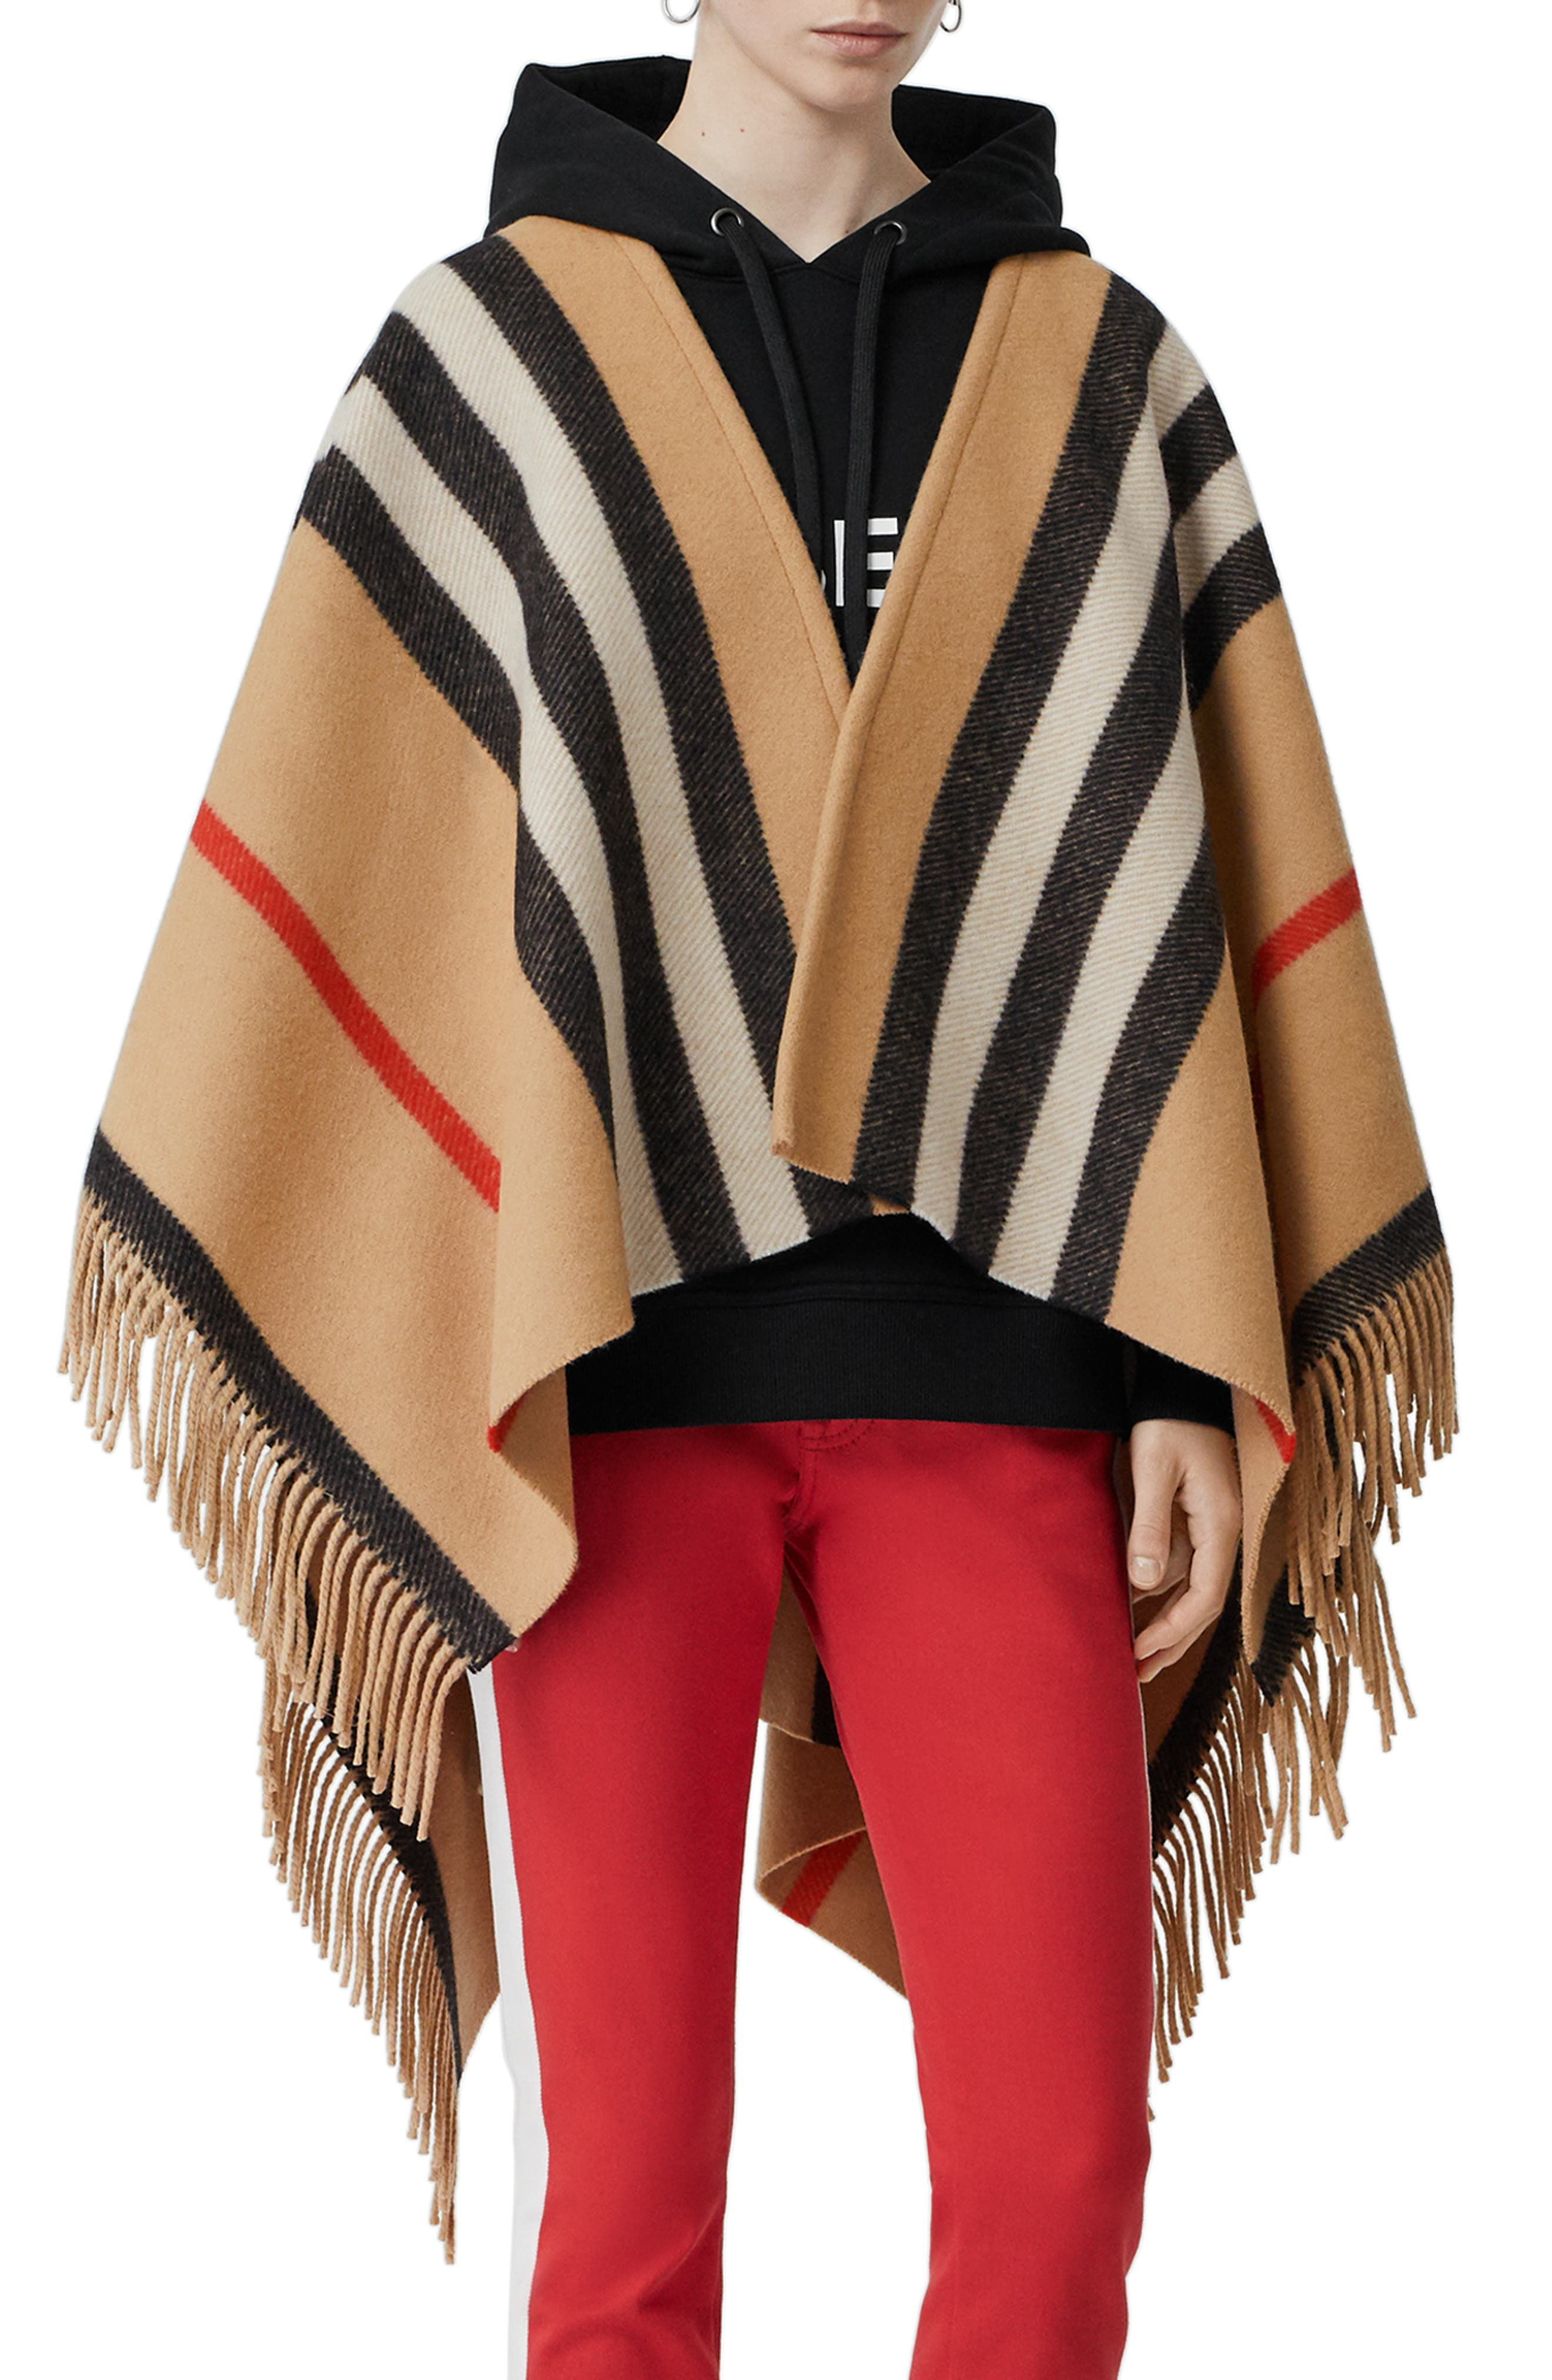 BURBERRY Stripe Fringe Wool Cape, Main, color, CAMEL